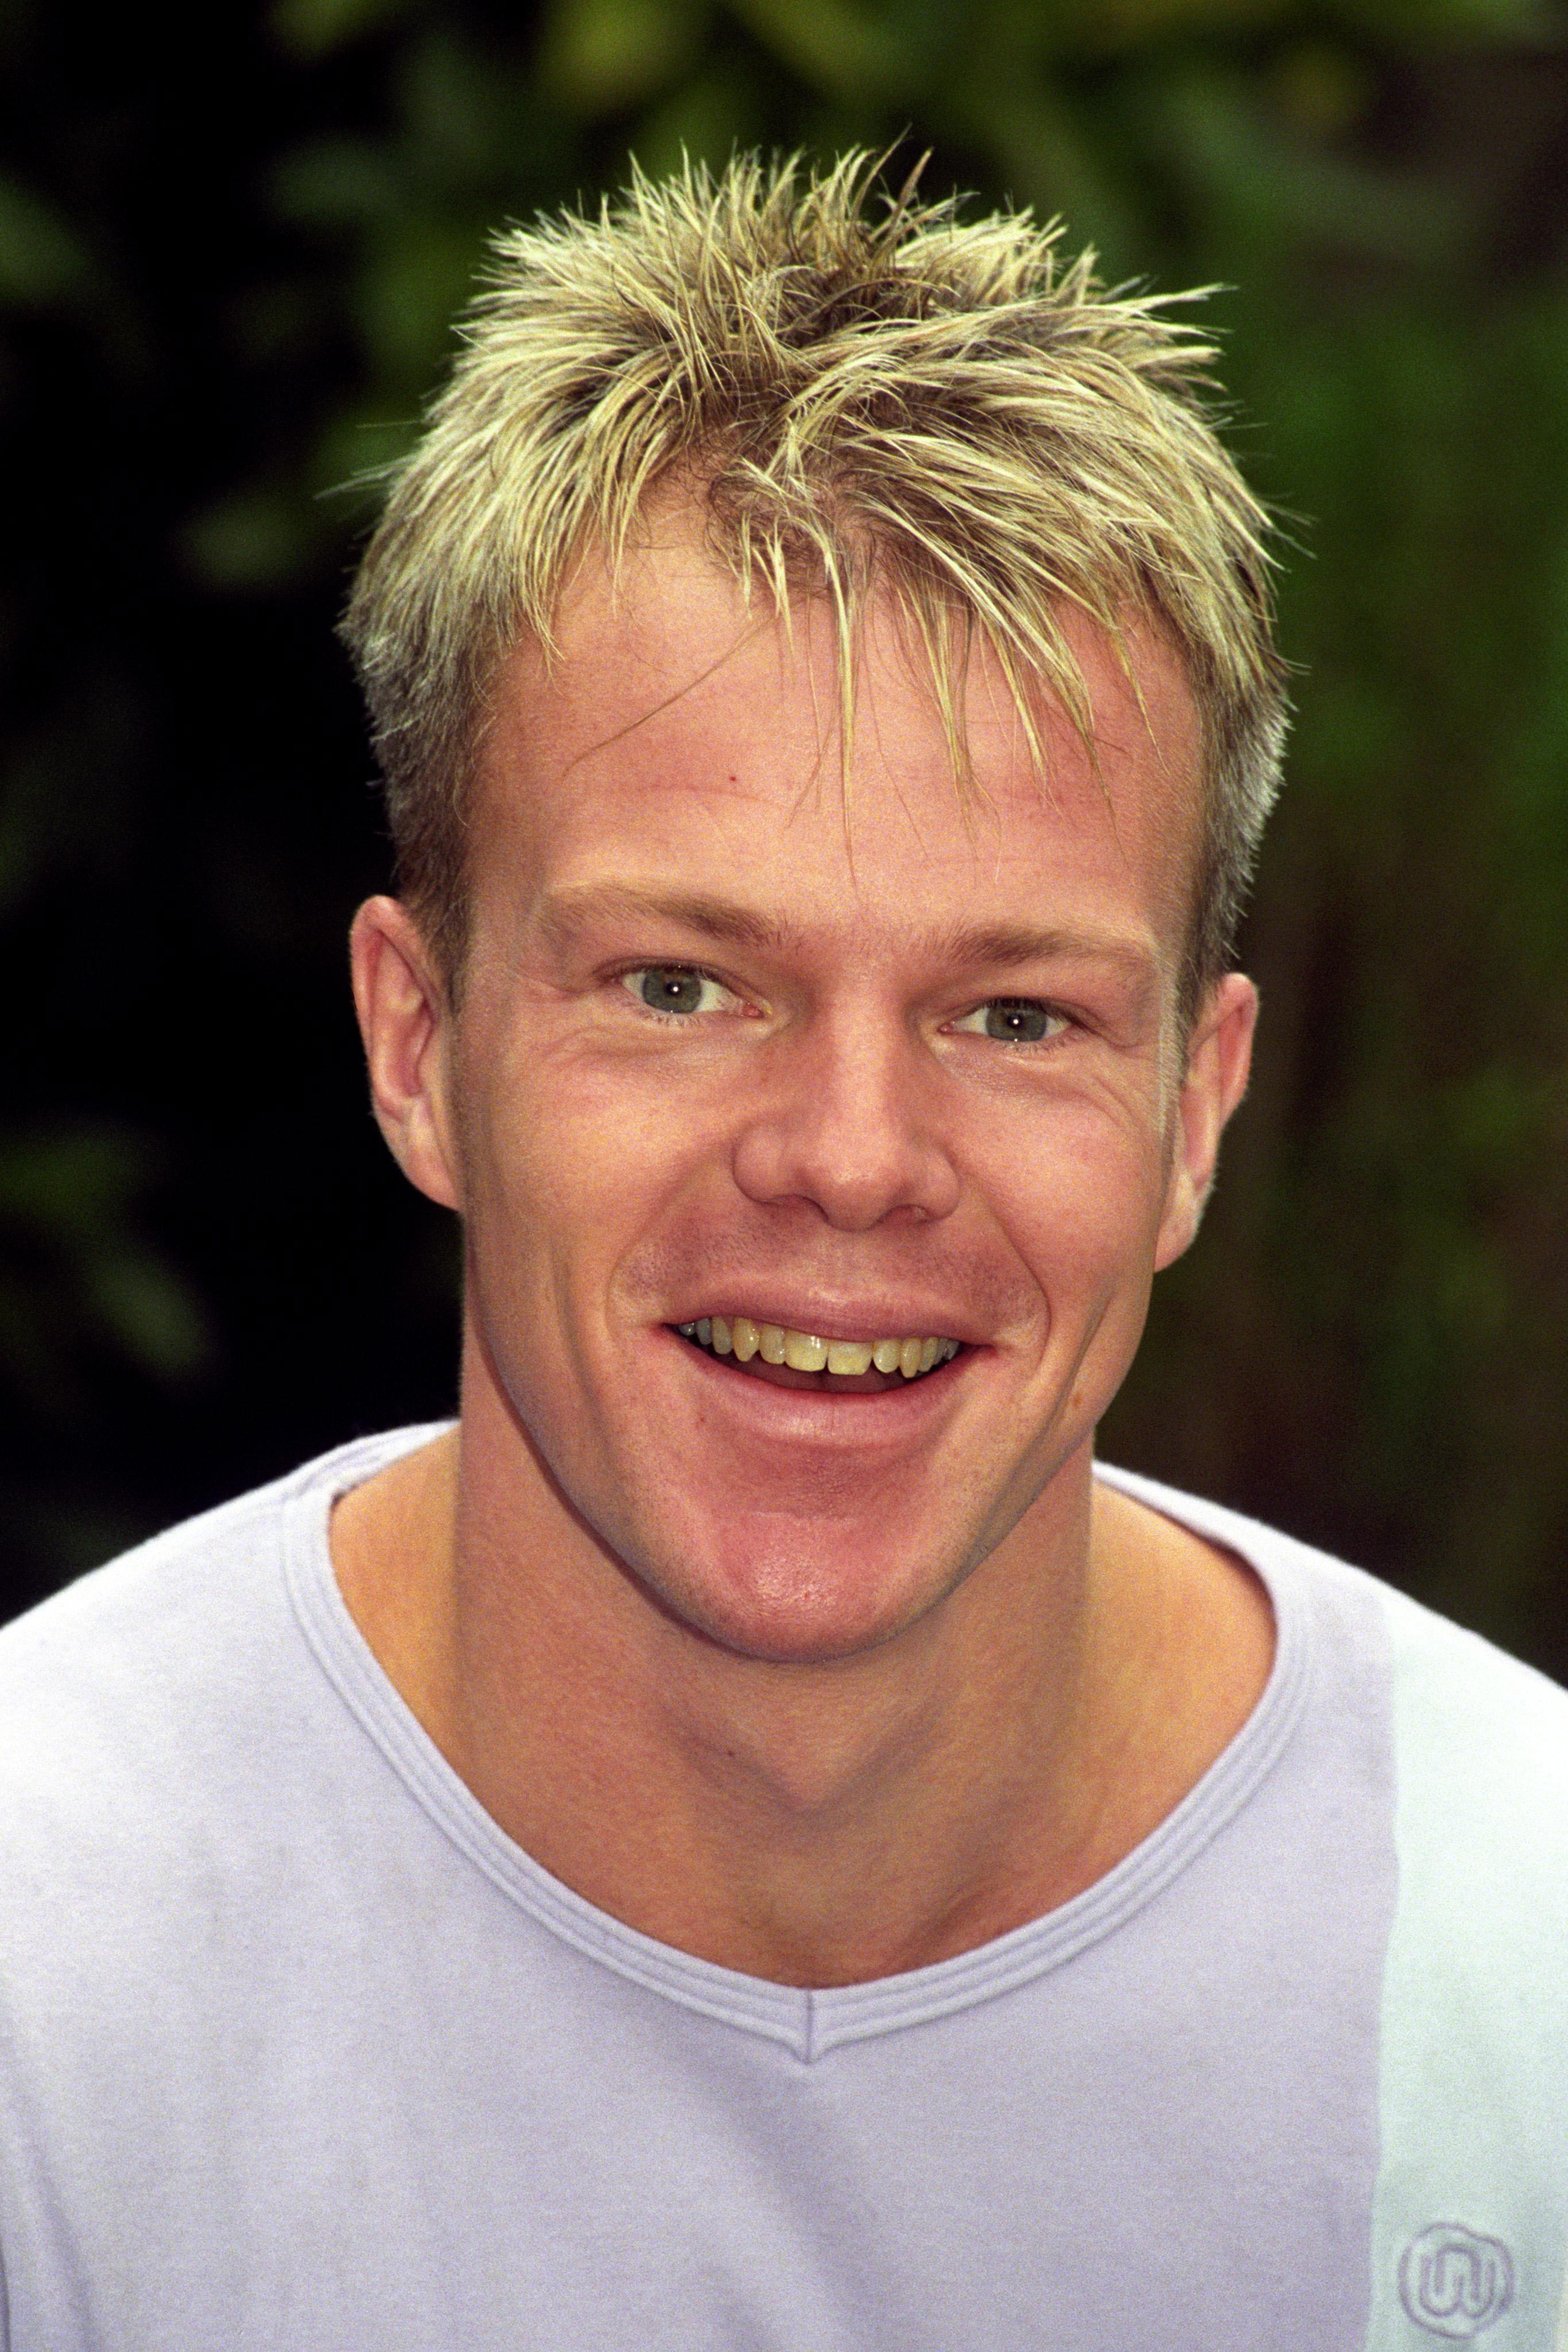 Missing presenter Speight 'found dead'